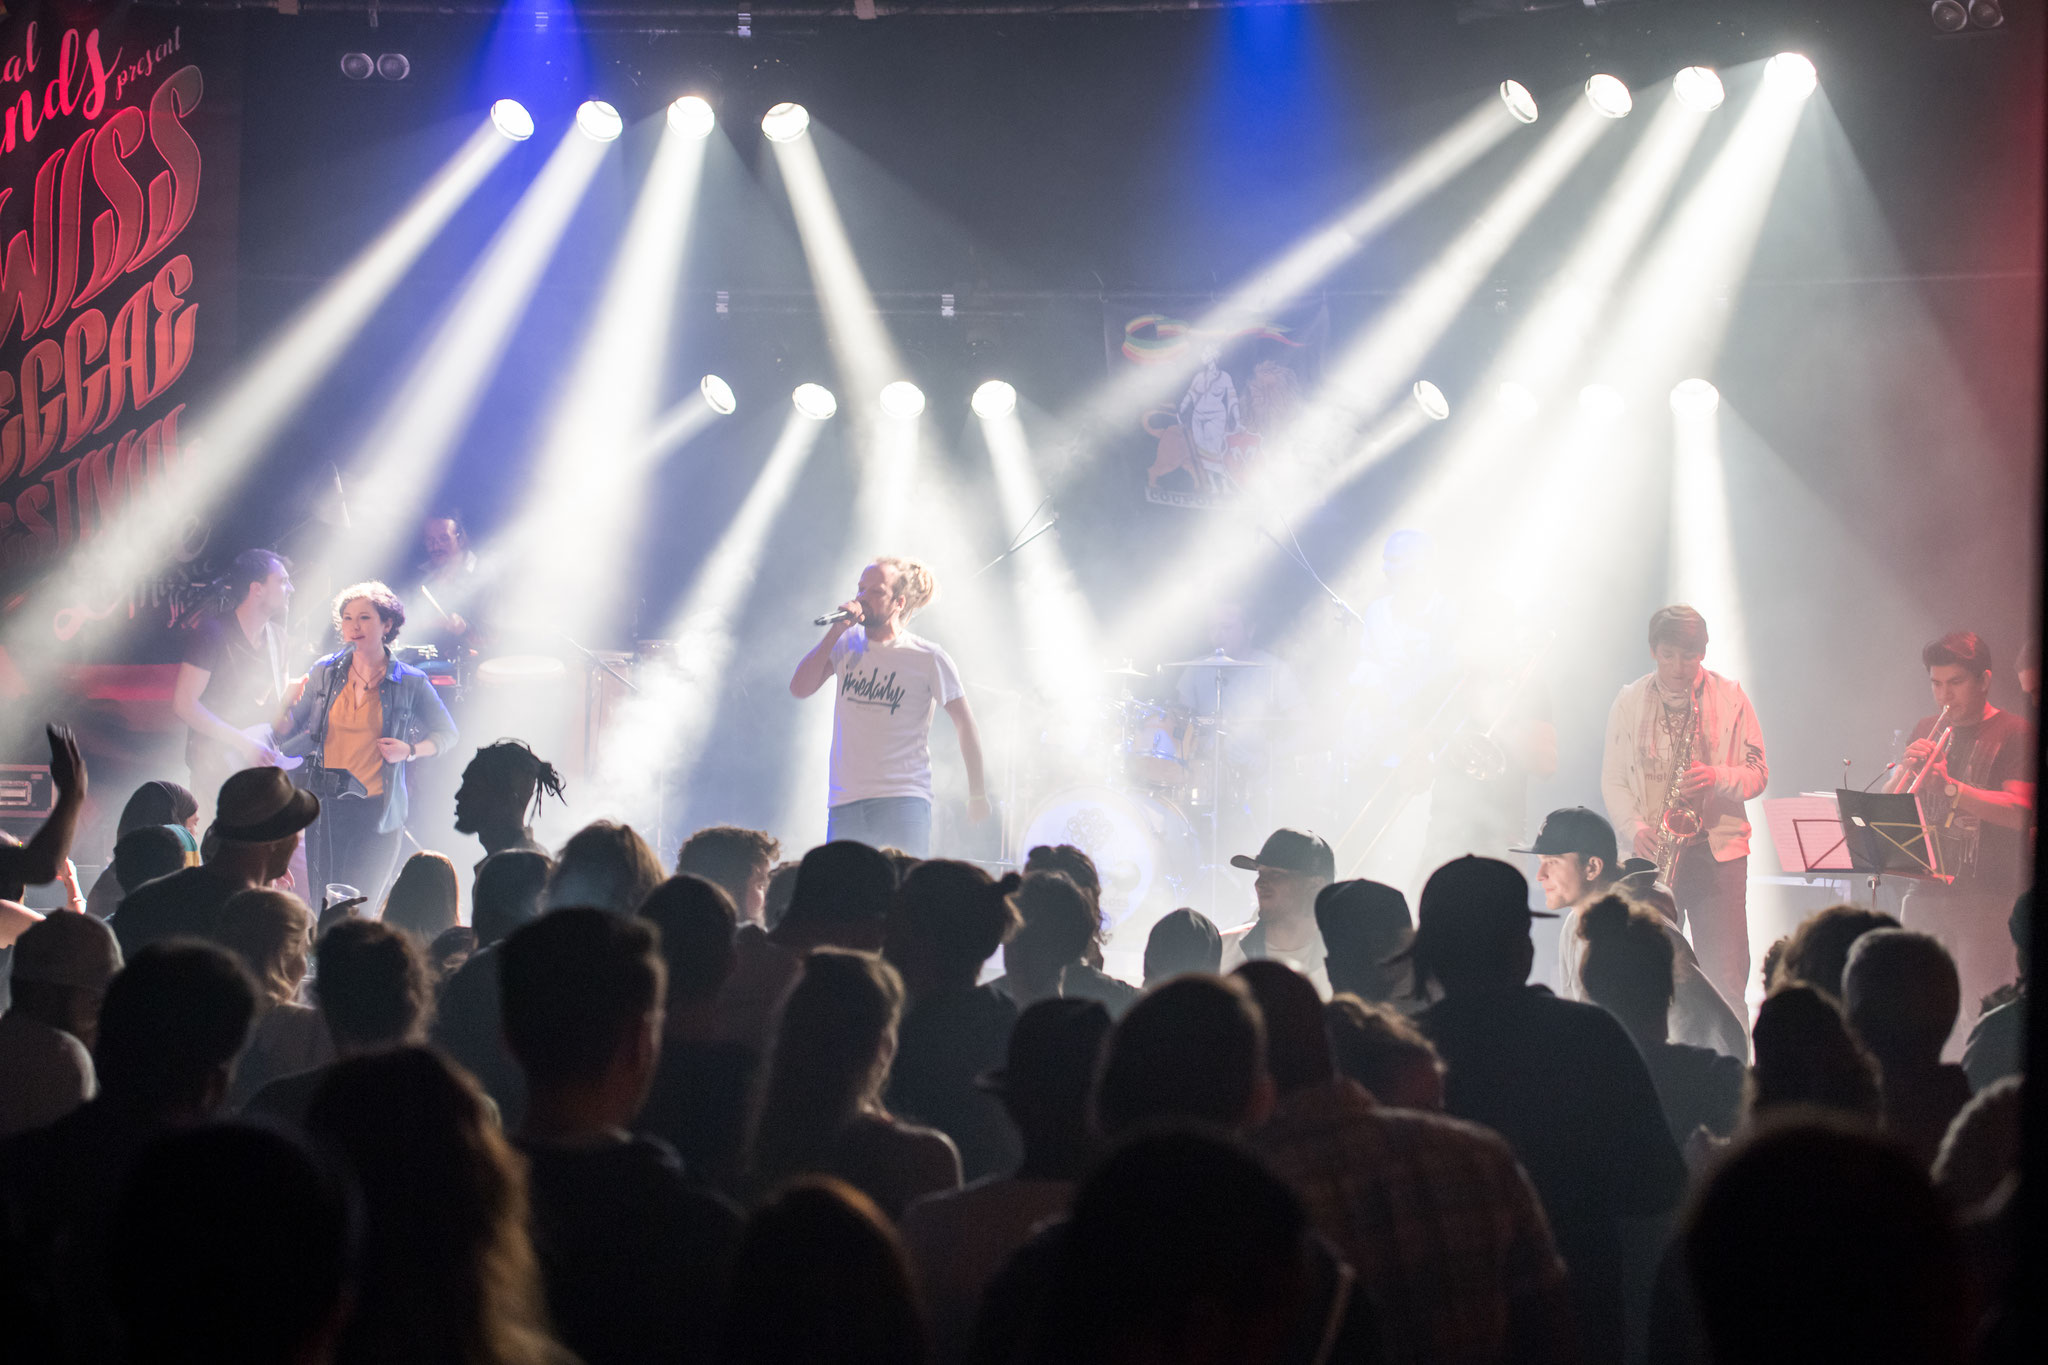 Swiss Reggae Festival, 27.10.17. Foto: March Hächler